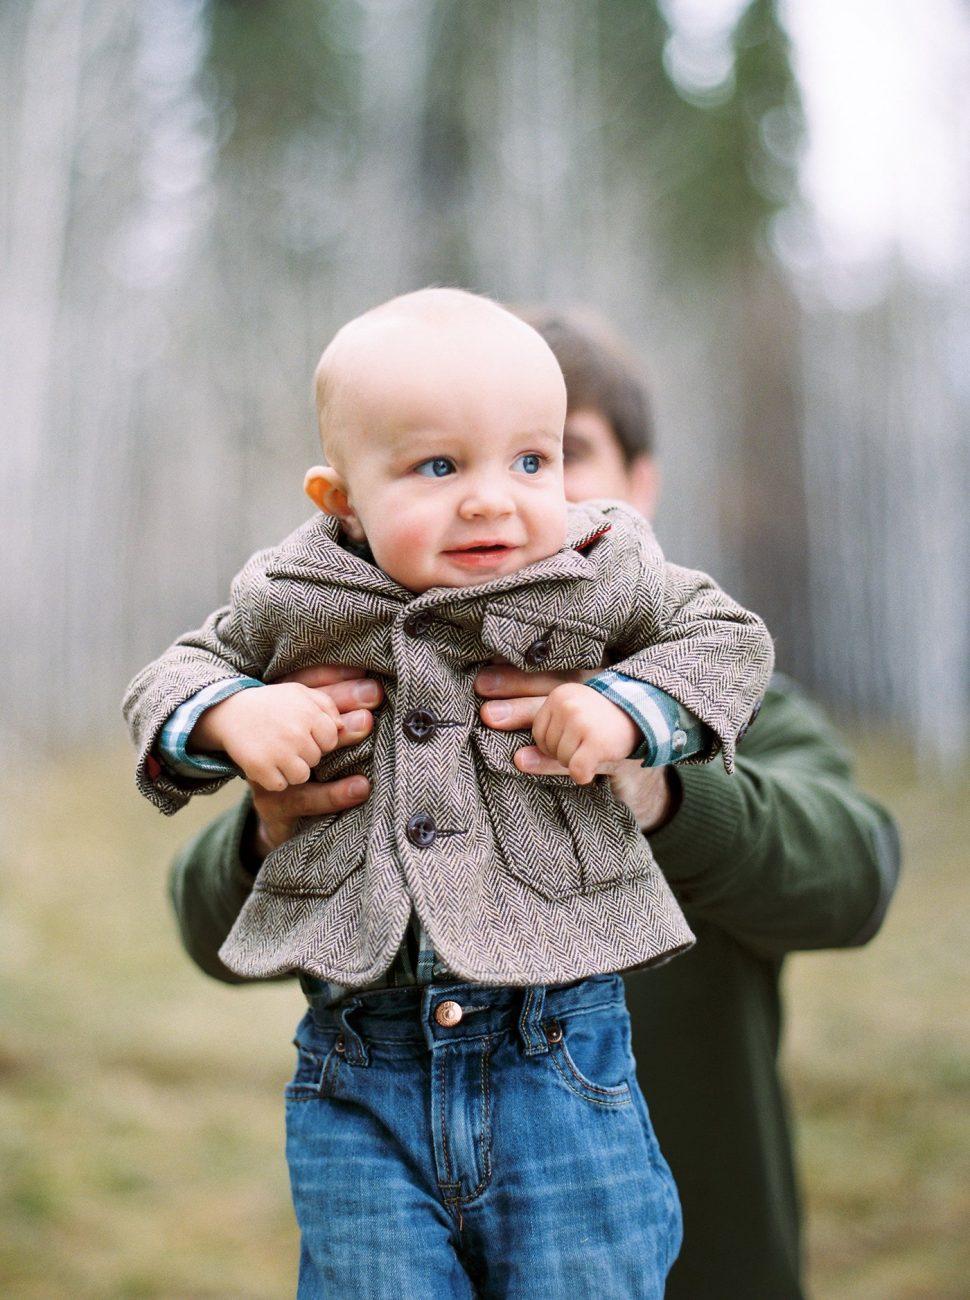 Sweet baby at Shevlin Park